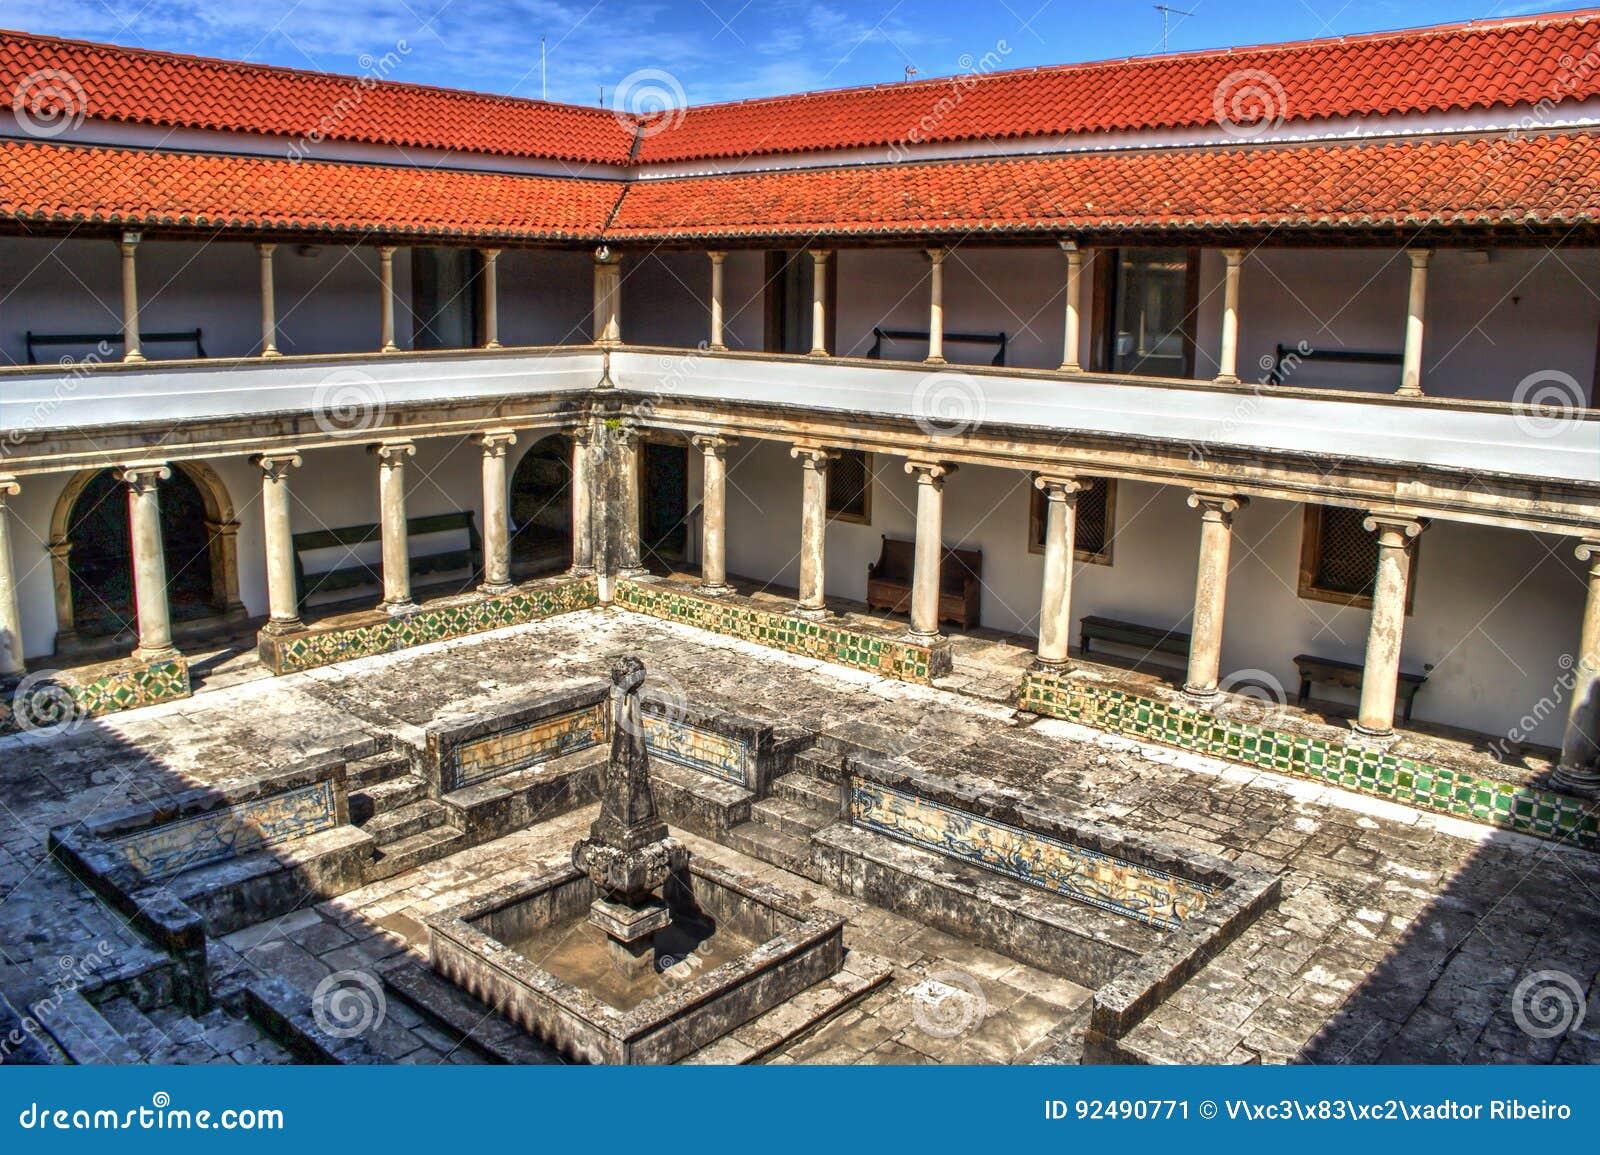 Cloister monastery of Jesus in Aveiro